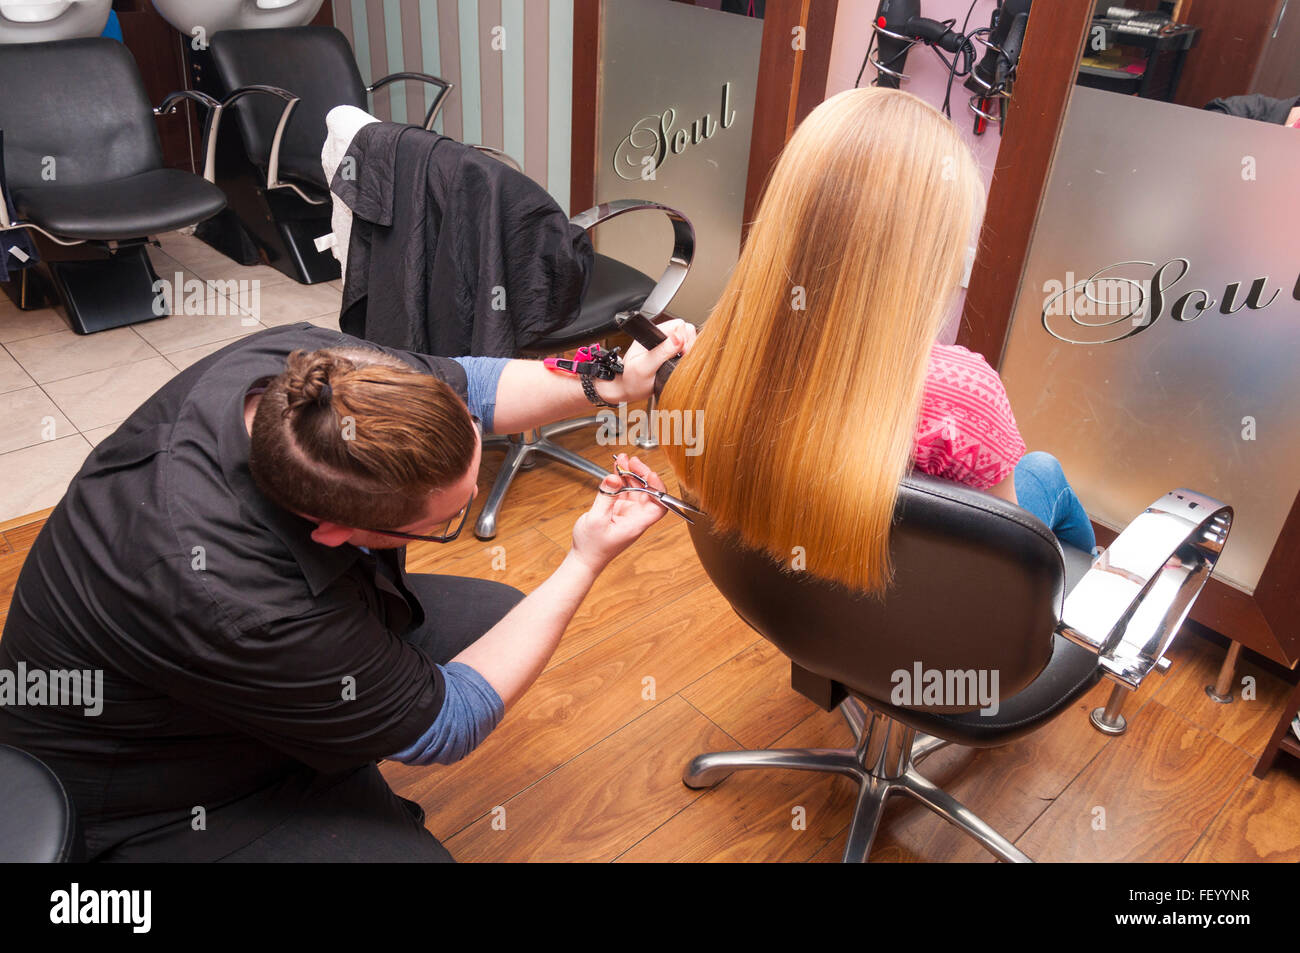 Girl having a haircut in a salon - Stock Image